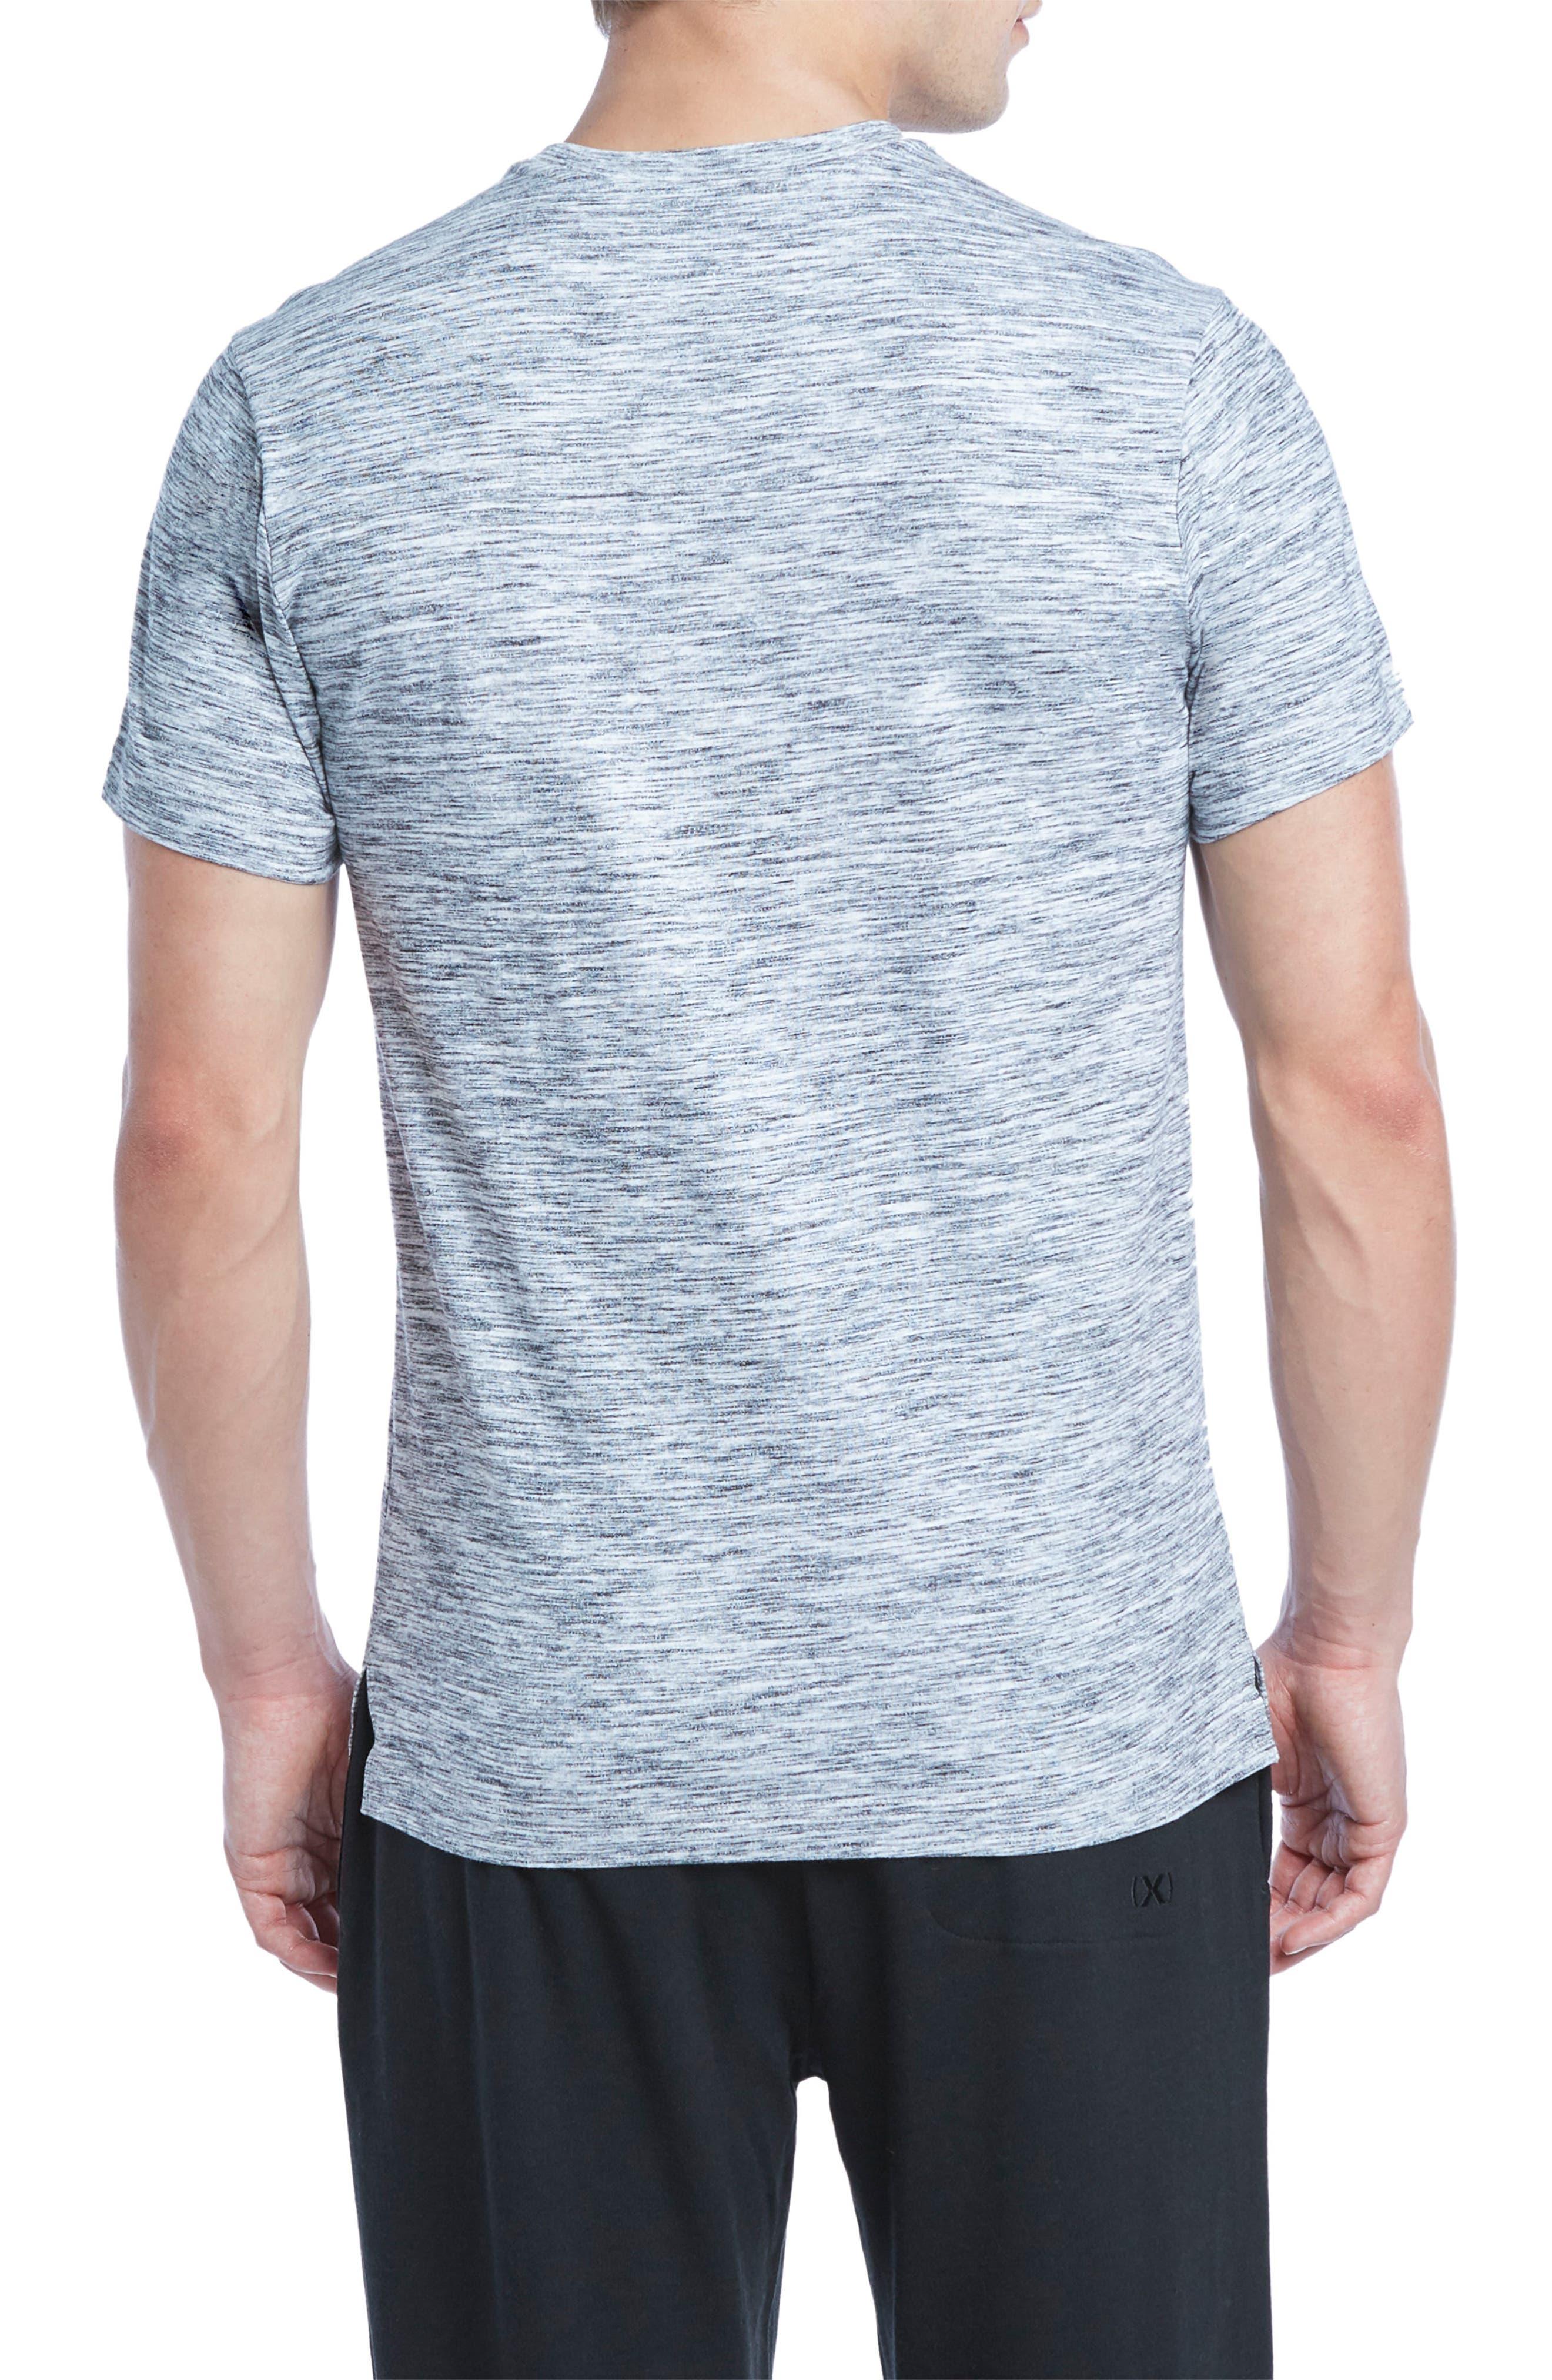 Static Crewneck Cotton T-Shirt,                             Alternate thumbnail 2, color,                             Black/ White